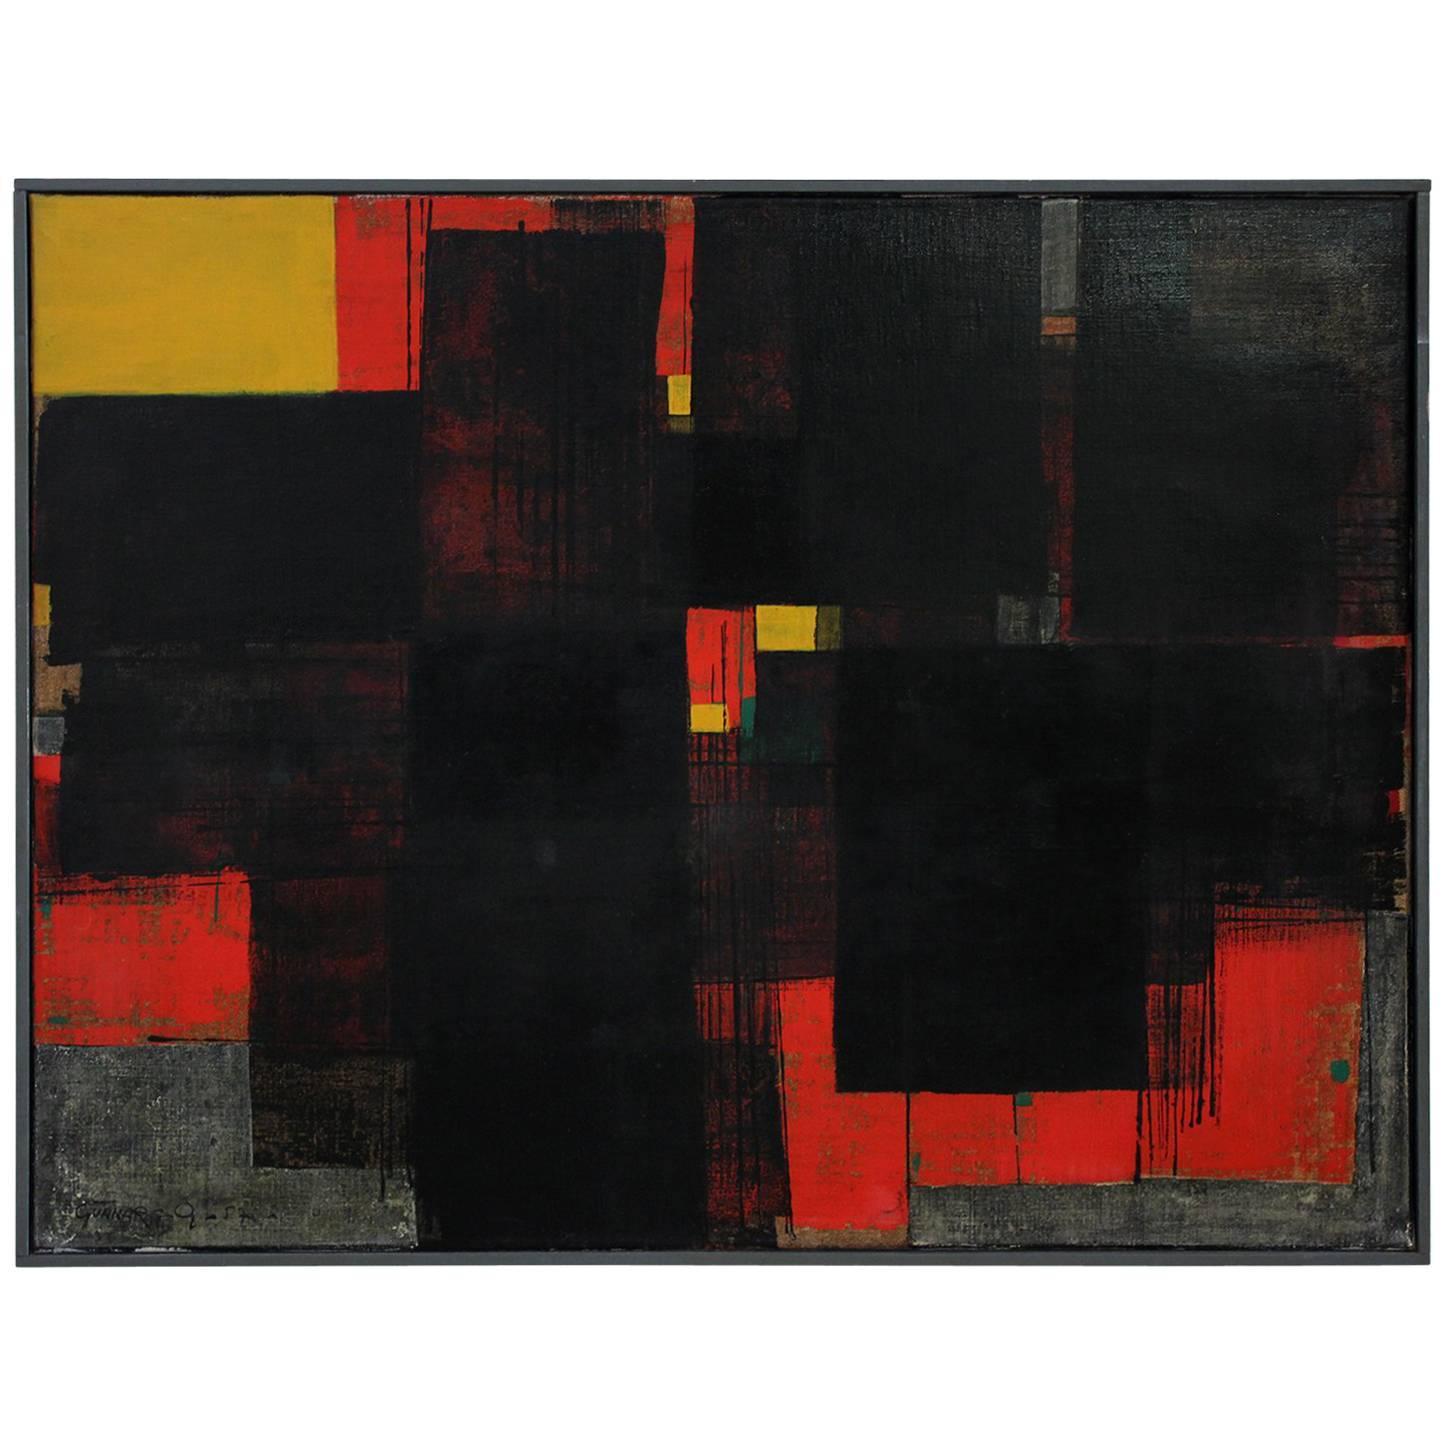 Gunnar S. Gundersen Abstract Oil on Canvas, 1957